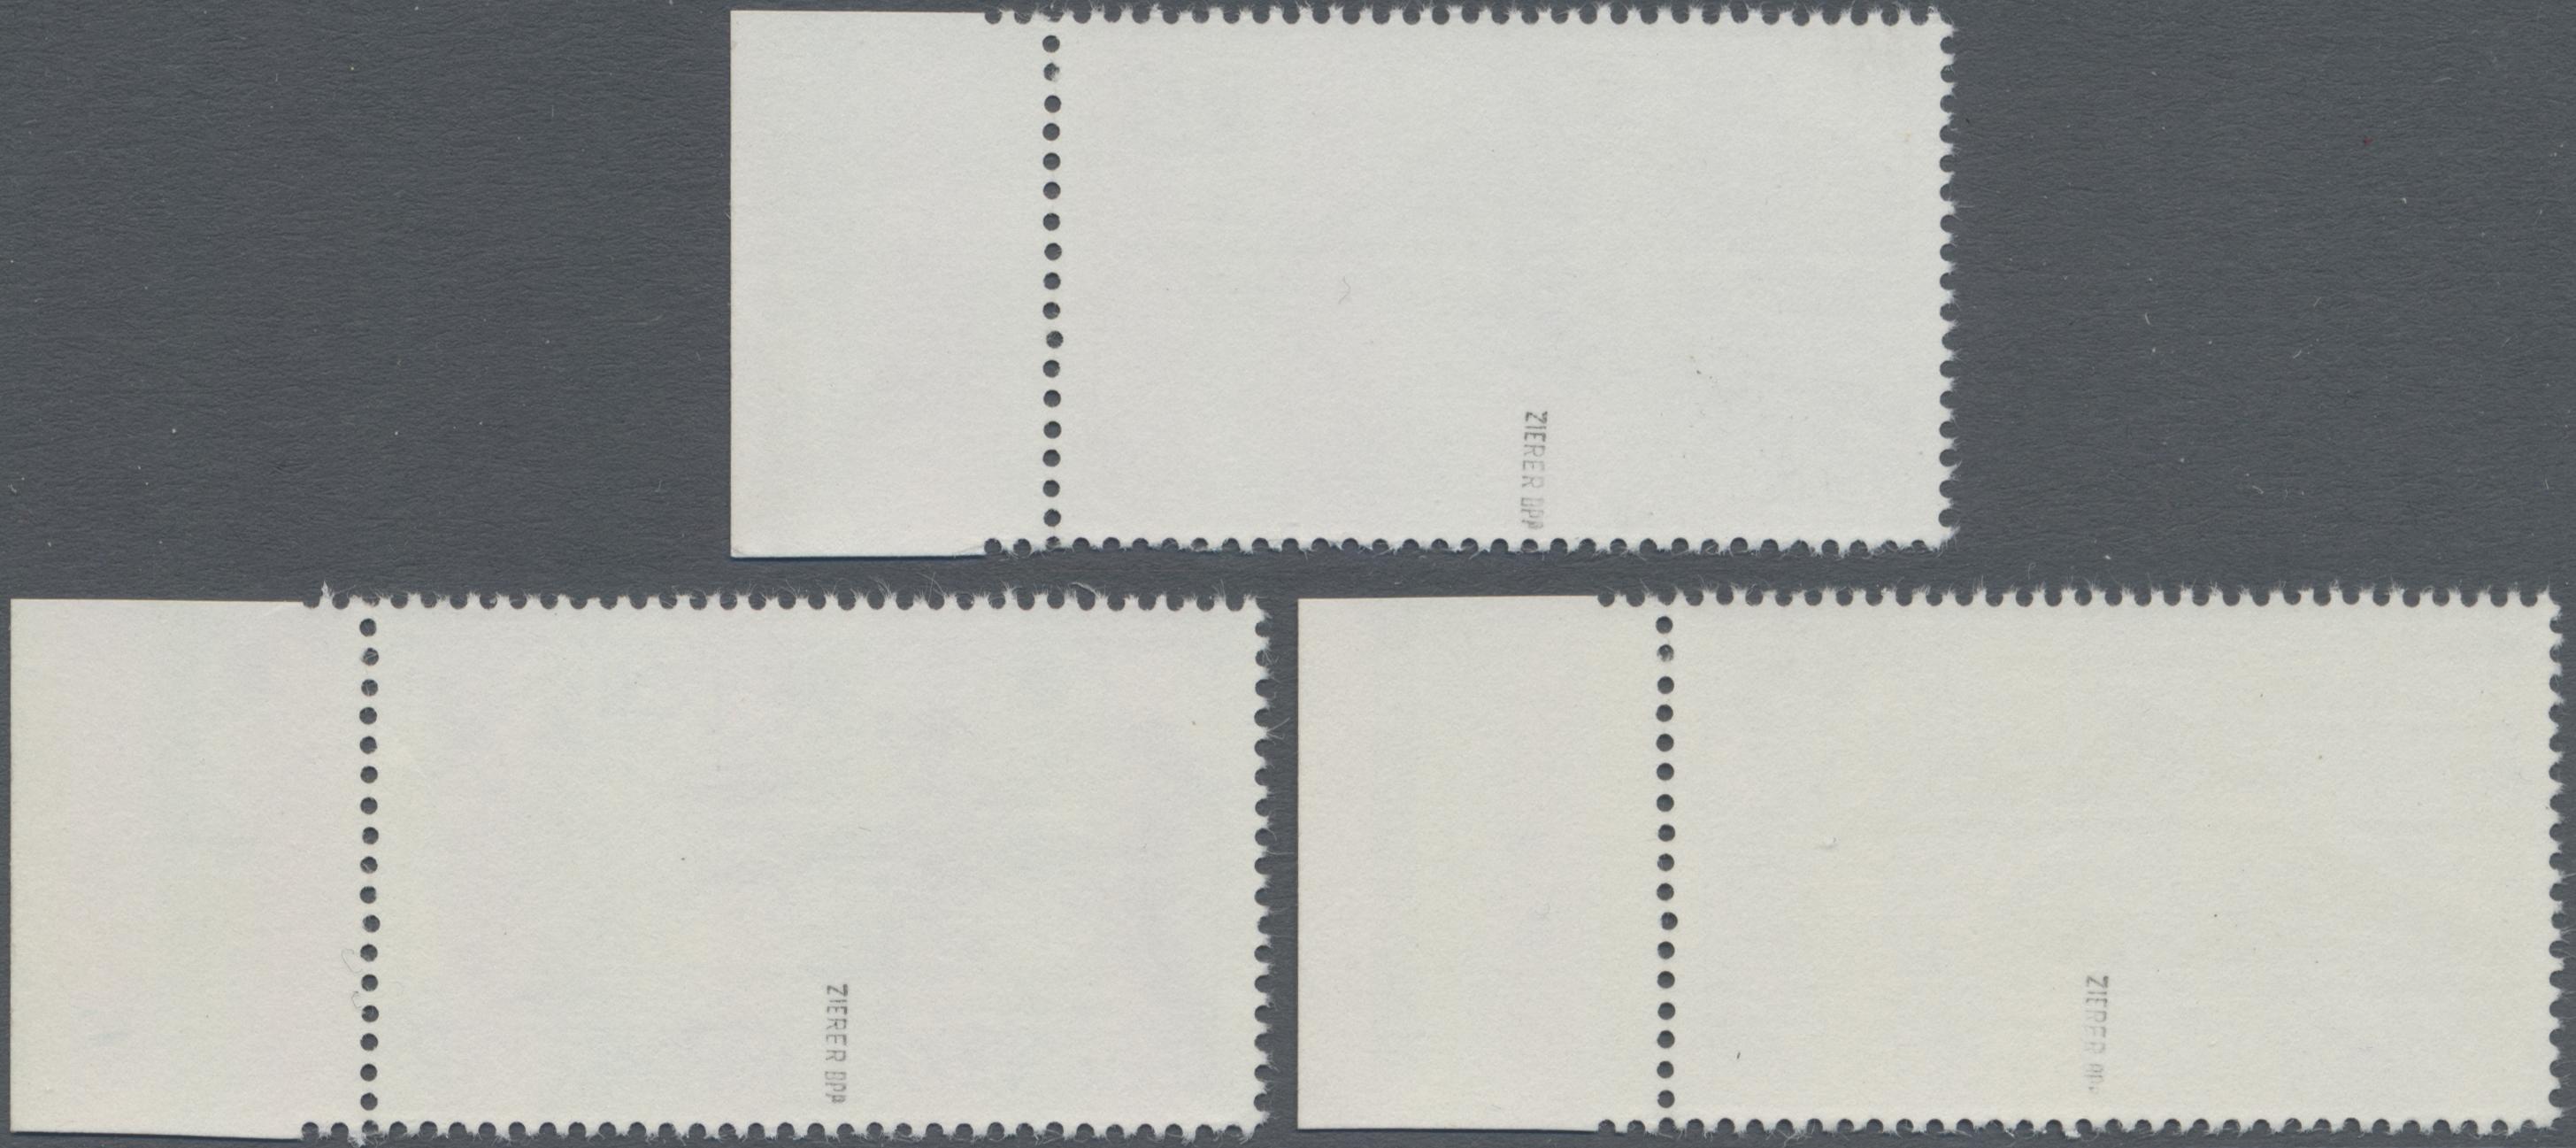 Lot 17396 - ddr  -  Auktionshaus Christoph Gärtner GmbH & Co. KG Sale #47 Single lots: Germany, Picture Postcards